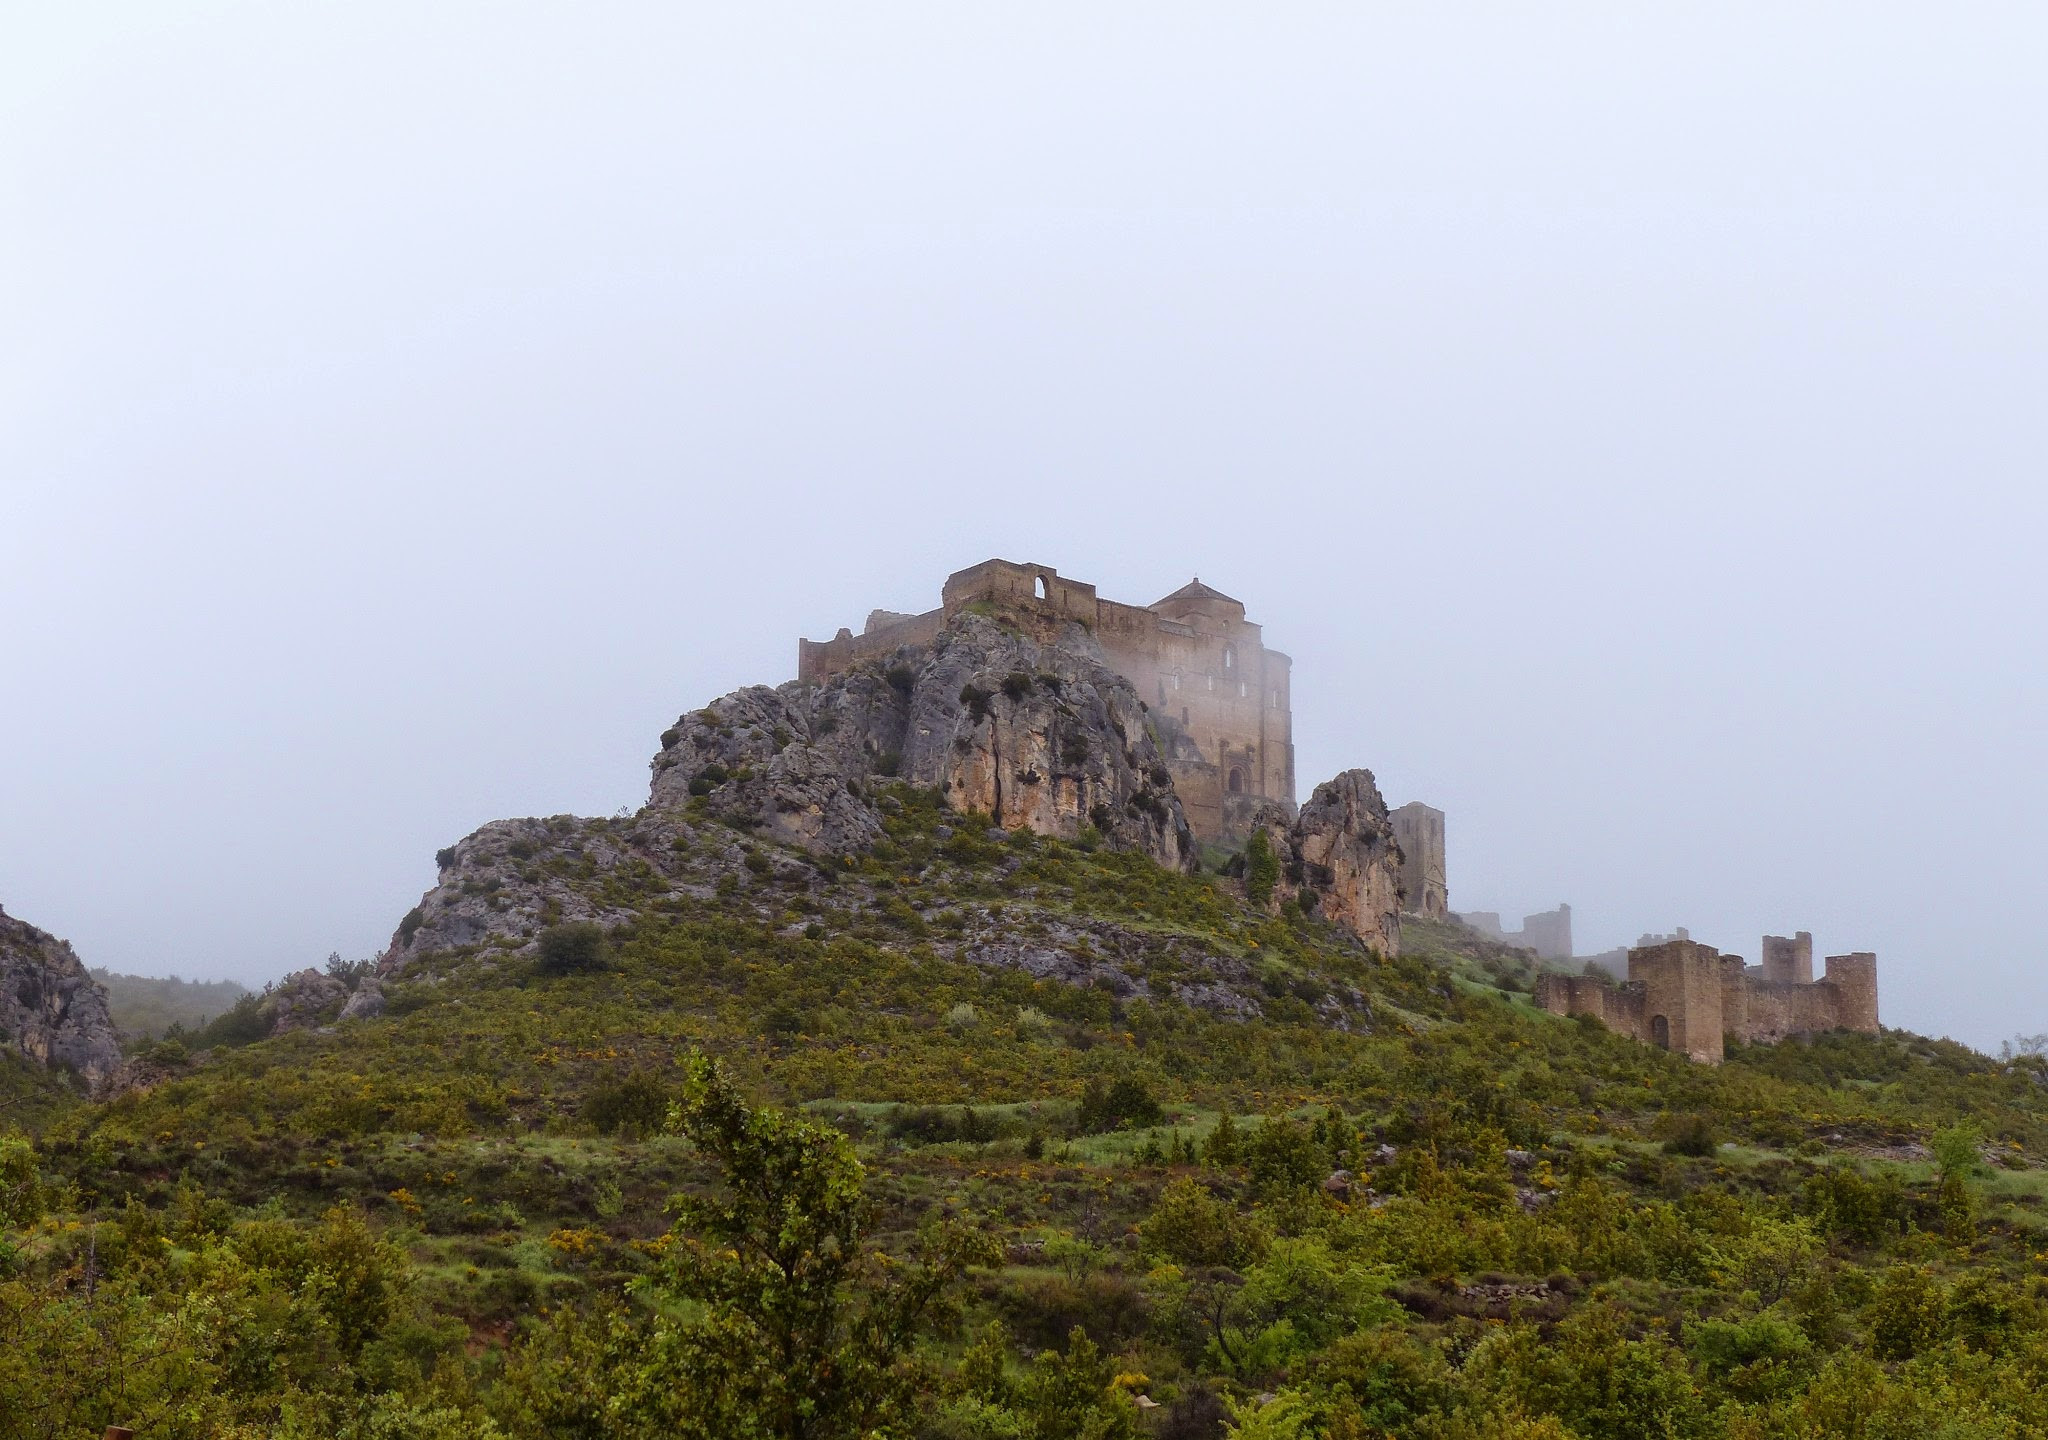 Castillo de Loarre - 08